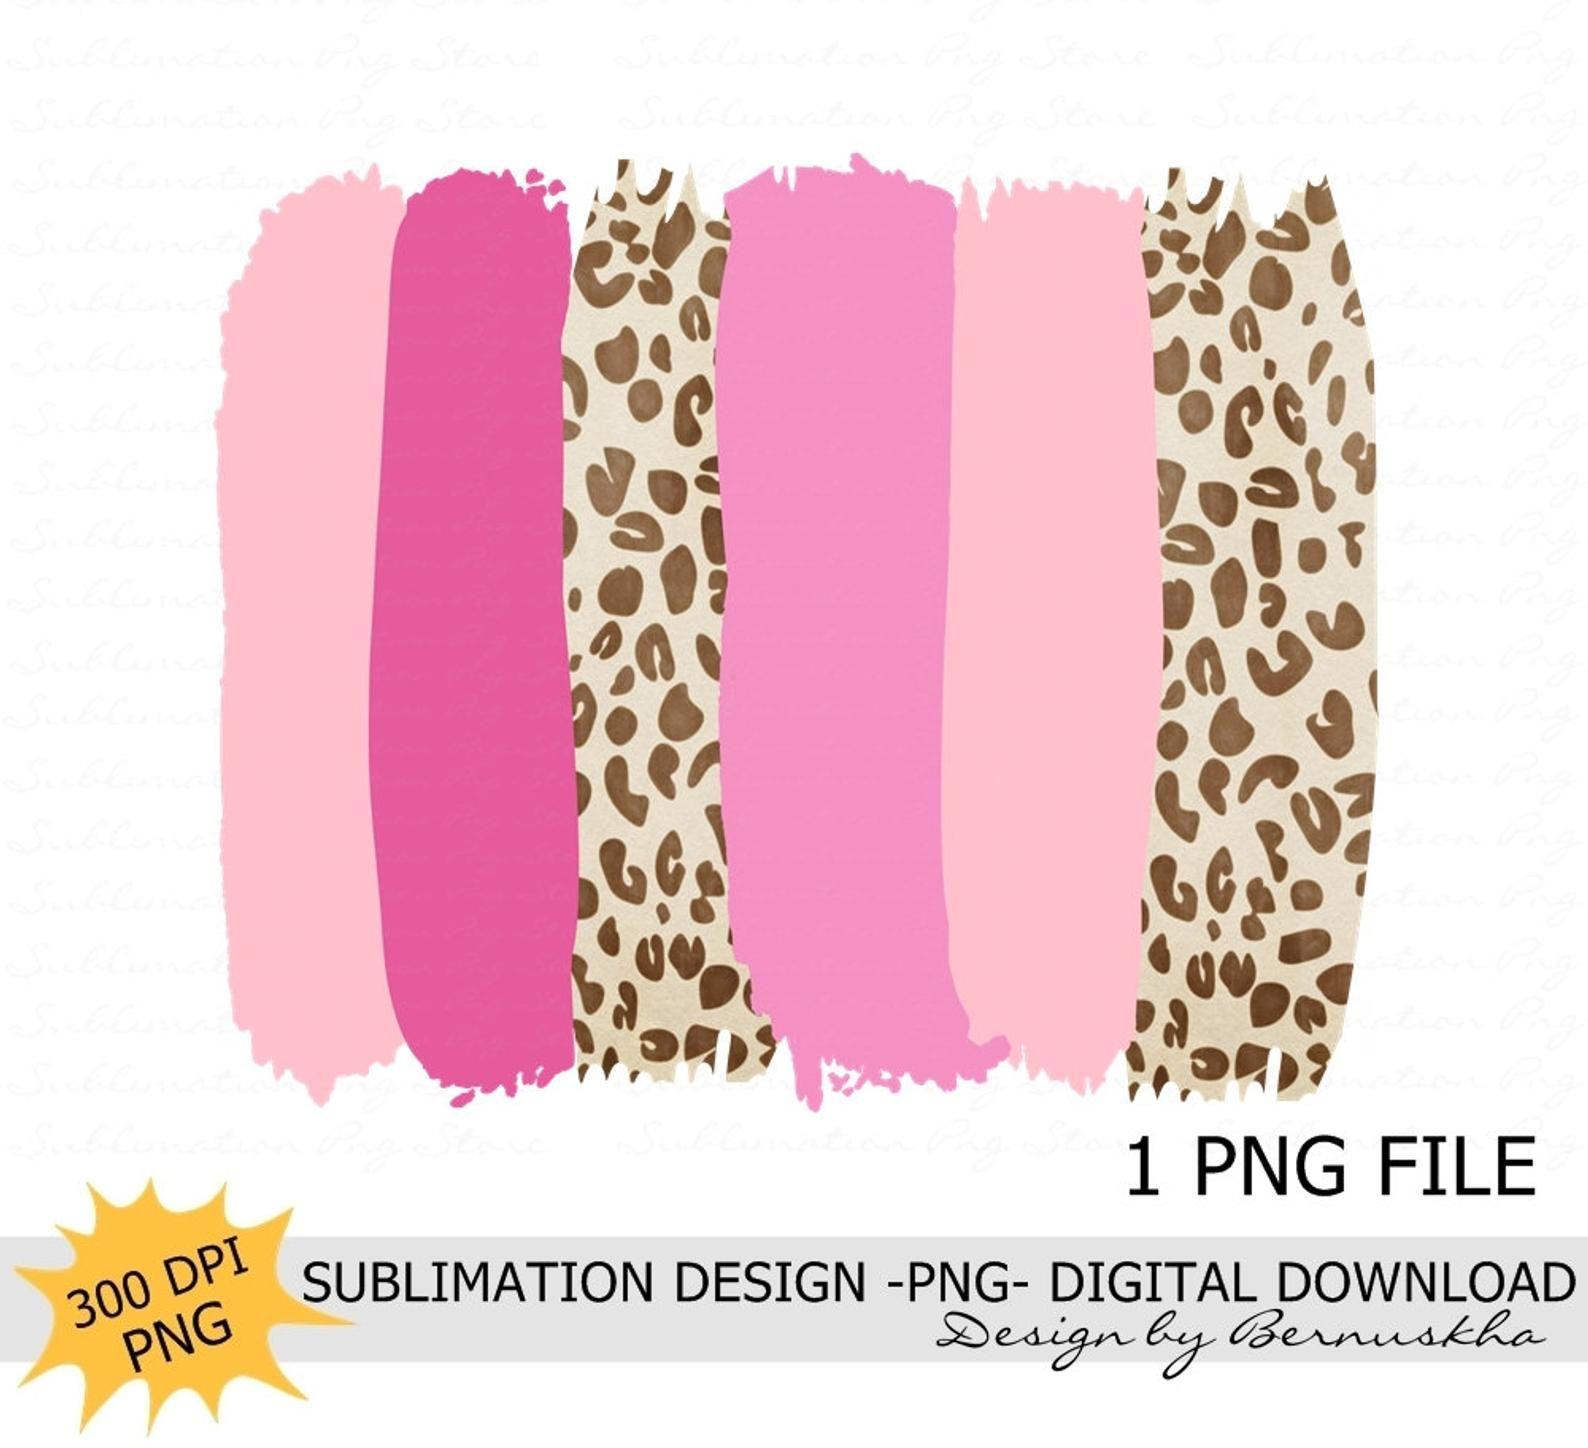 Pink Leopard Brush Strokes Background Sublimation Design Etsy In 2020 Brush Strokes Pink Leopard Sublime